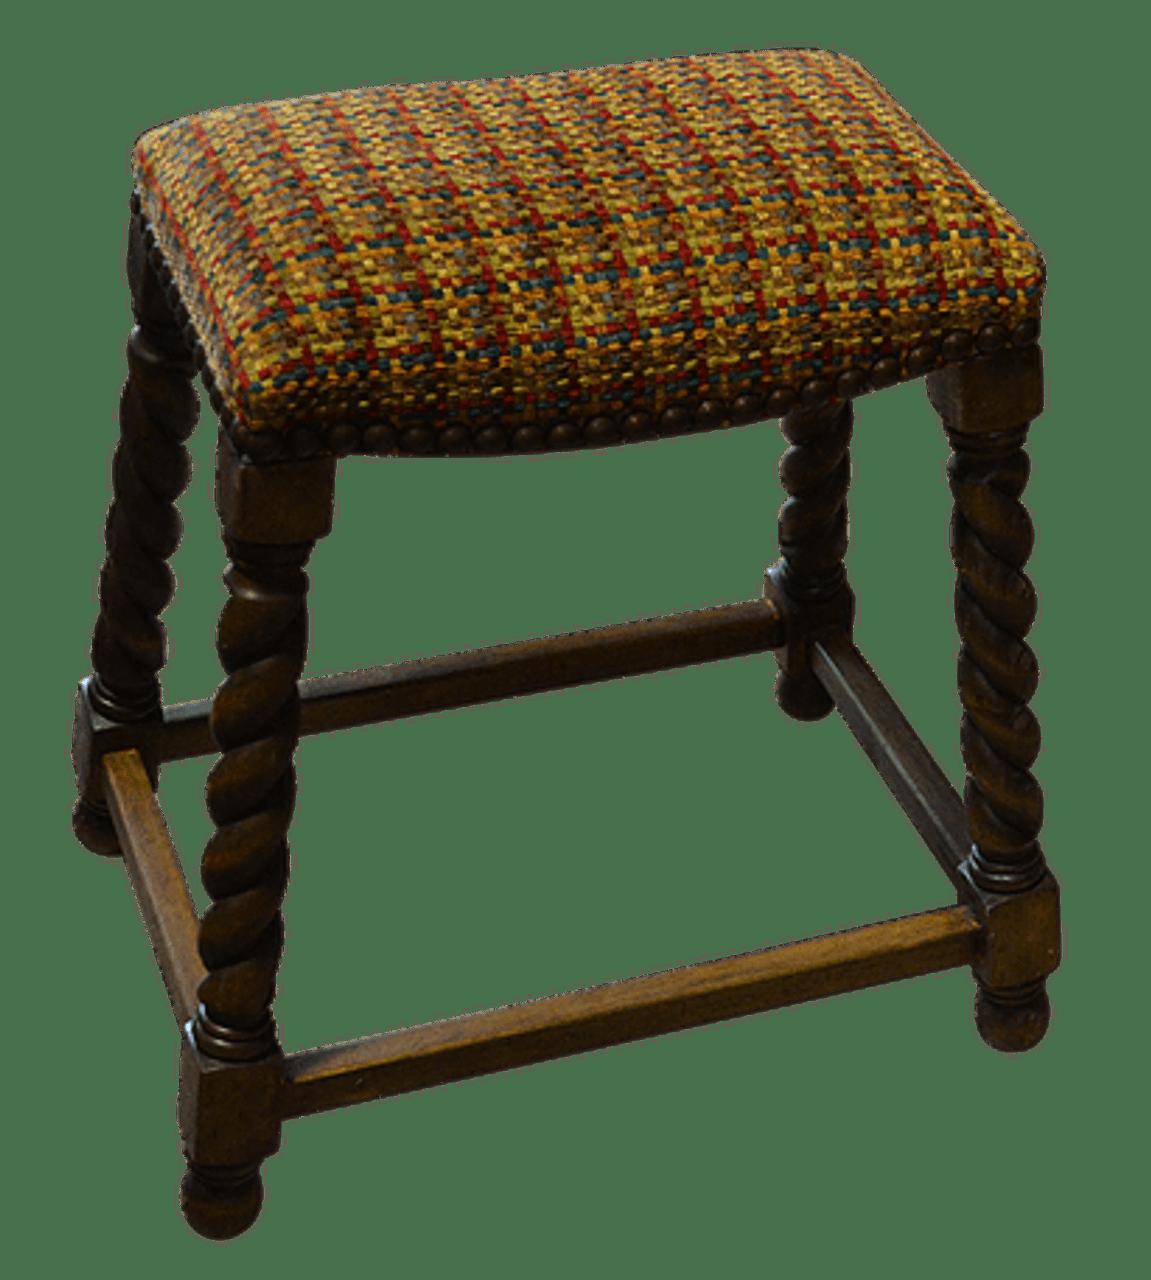 Twisted Leg Bar Stool Fabric Seat No Back